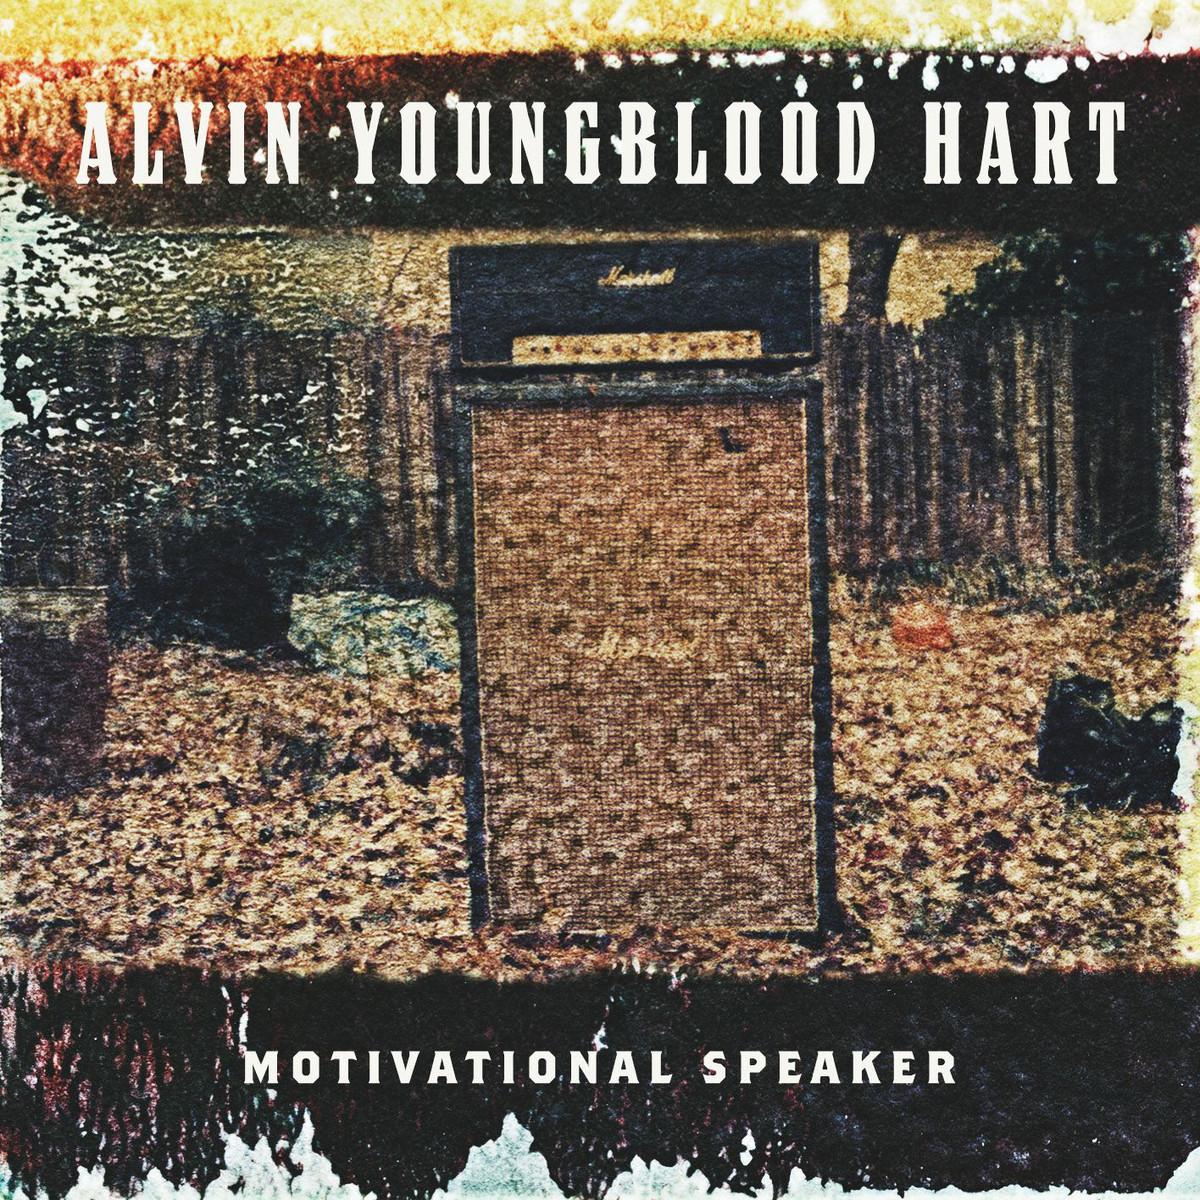 Hart, Alvin Youngblood: Motivational Speaker (2005)